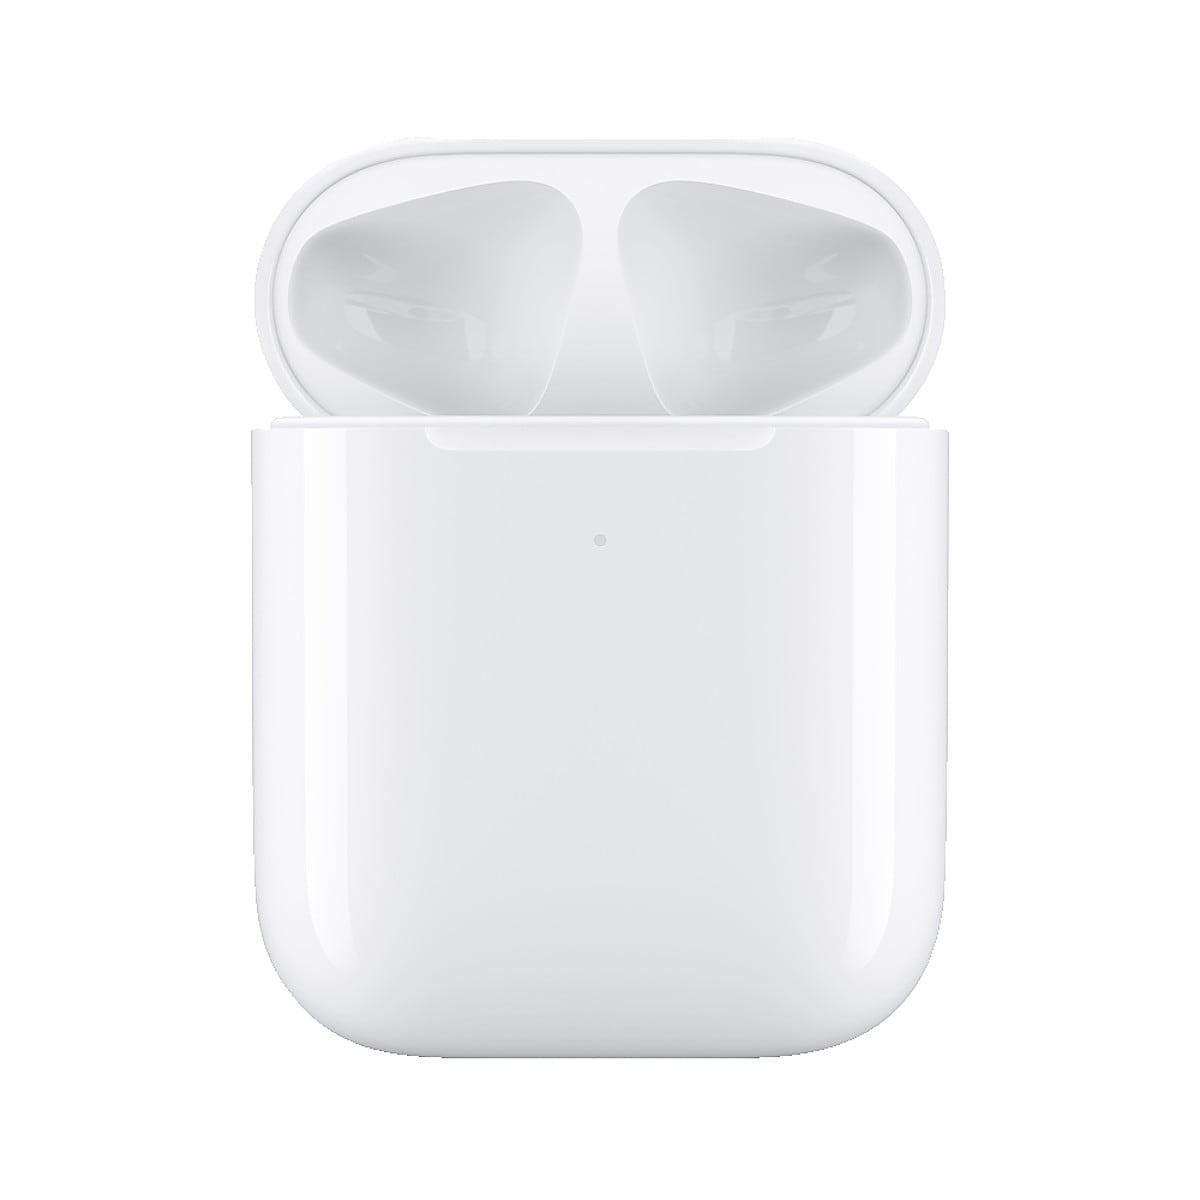 Apple AirPods 2, trådløst ladeetui